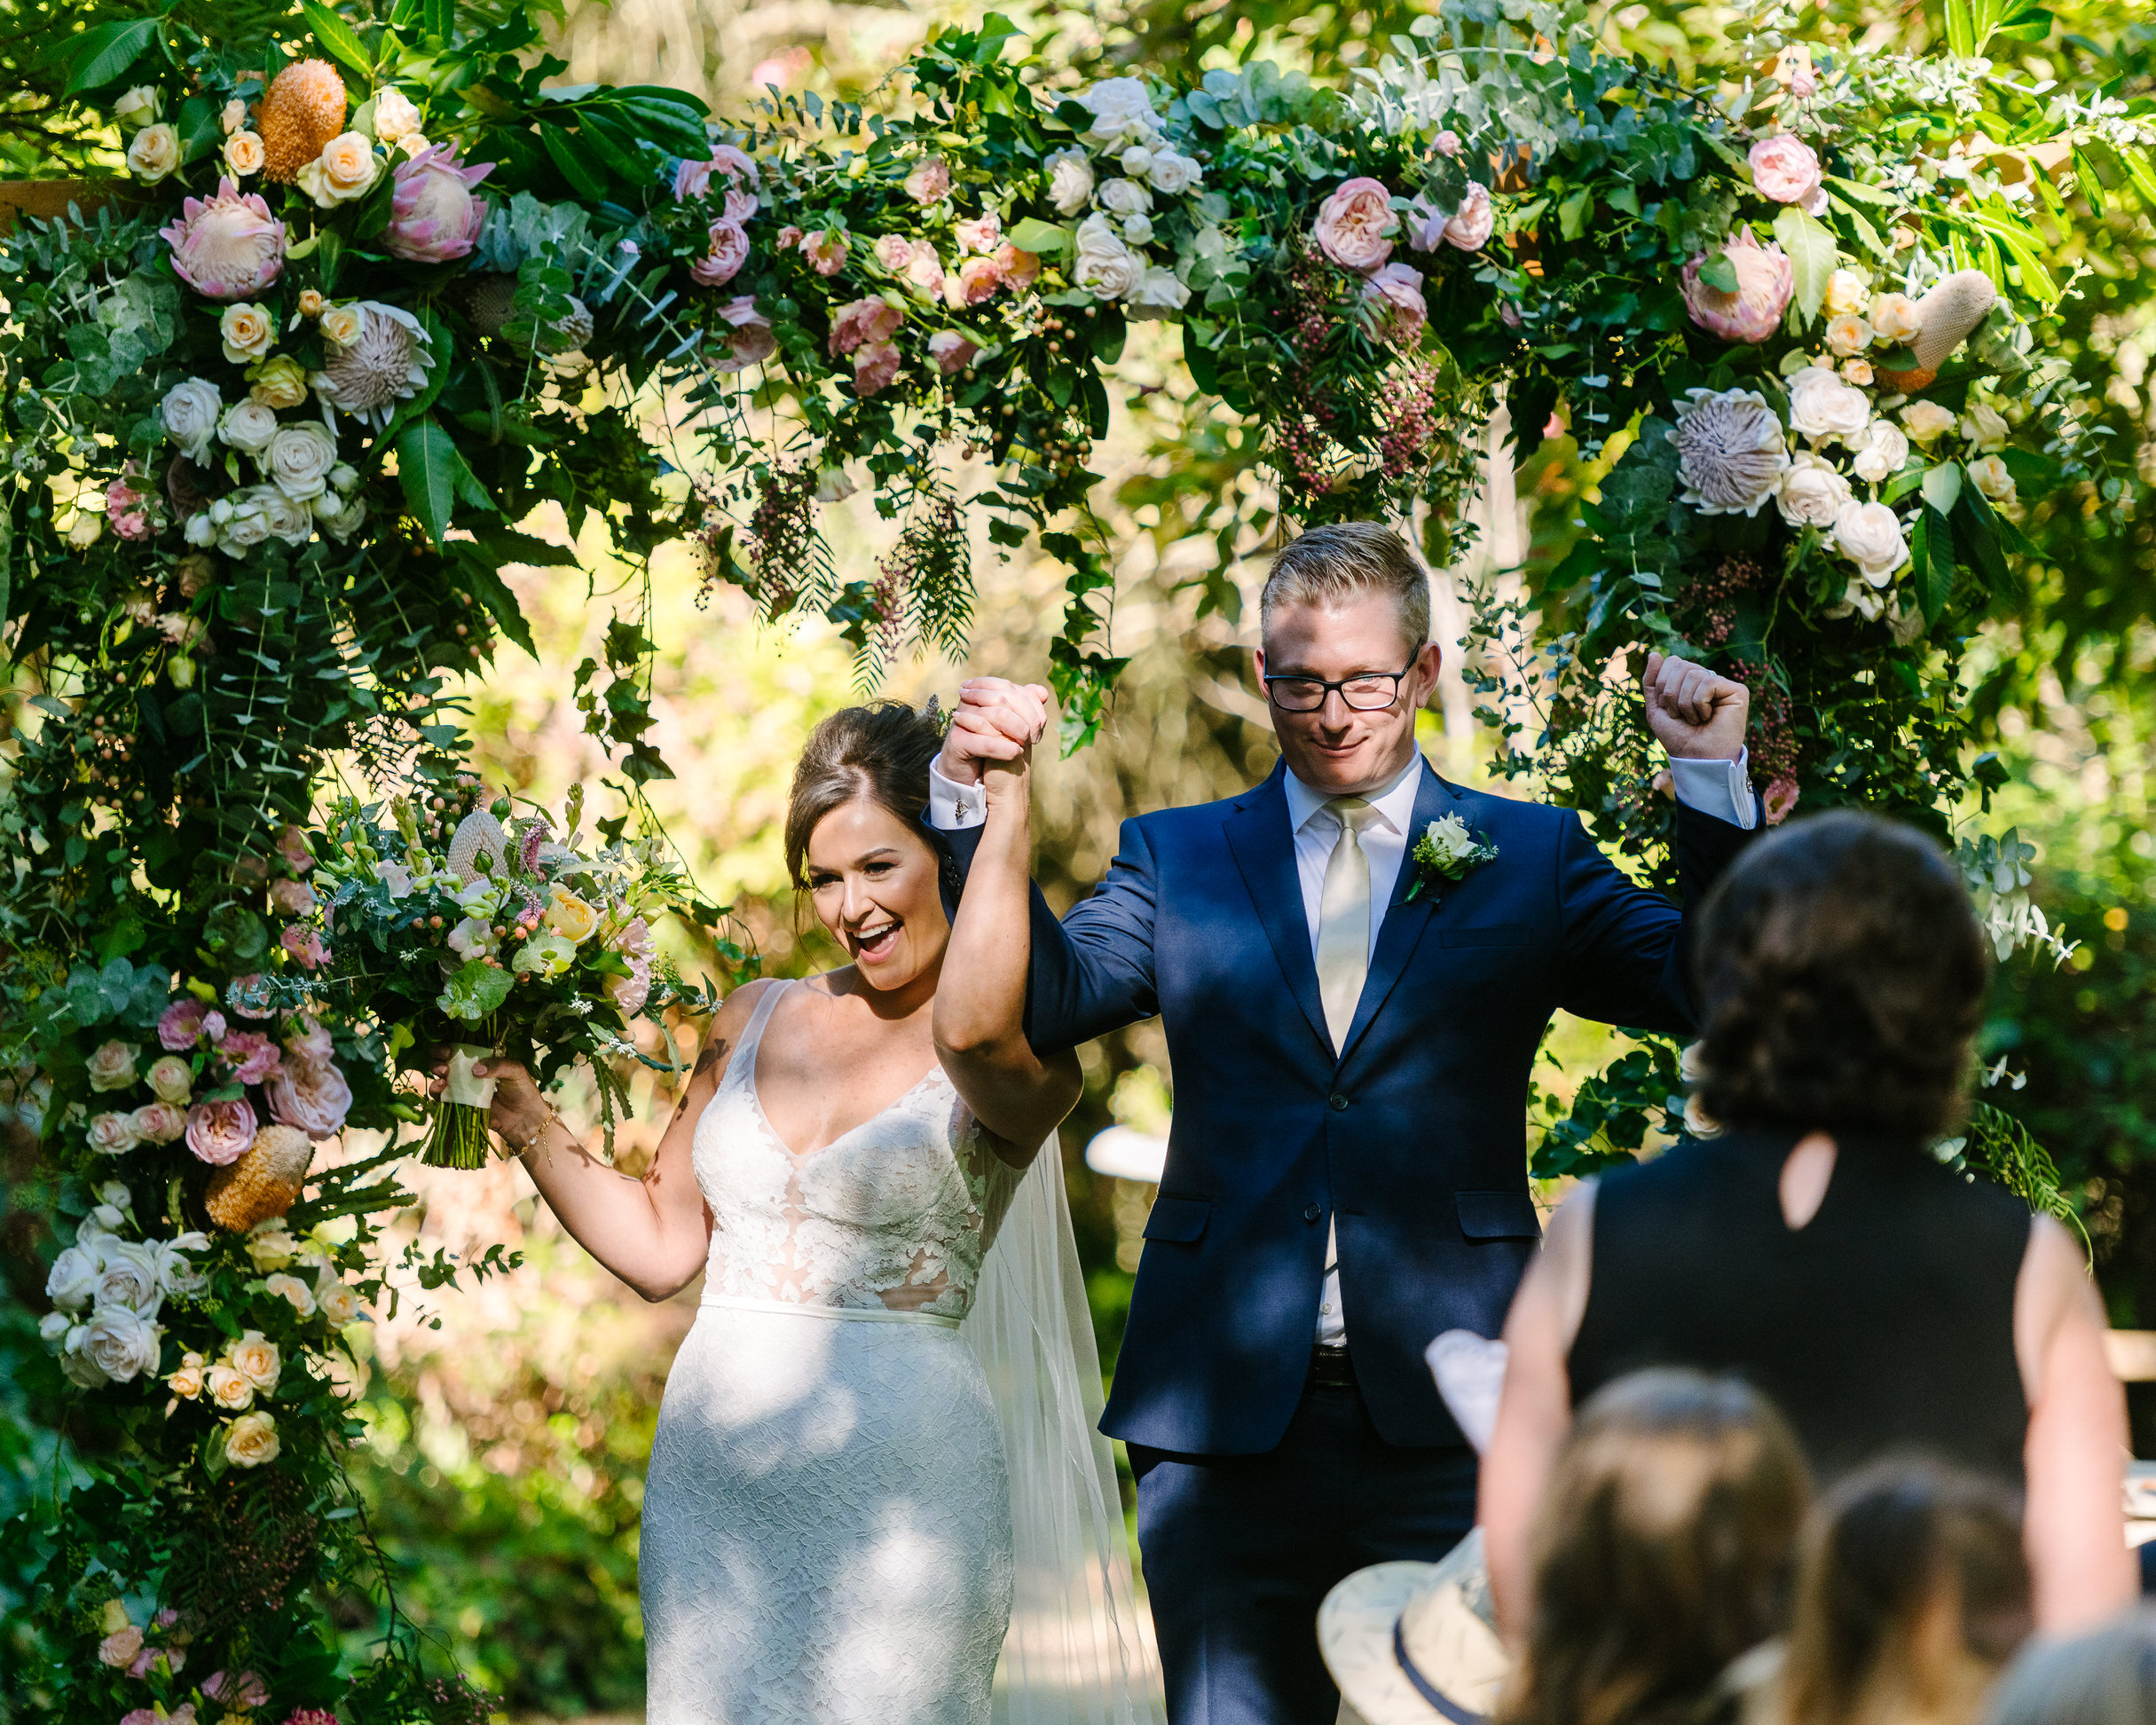 Justin_And_Jim_Photography_Chateau_Dore_Bendigo_Wedding45.JPG